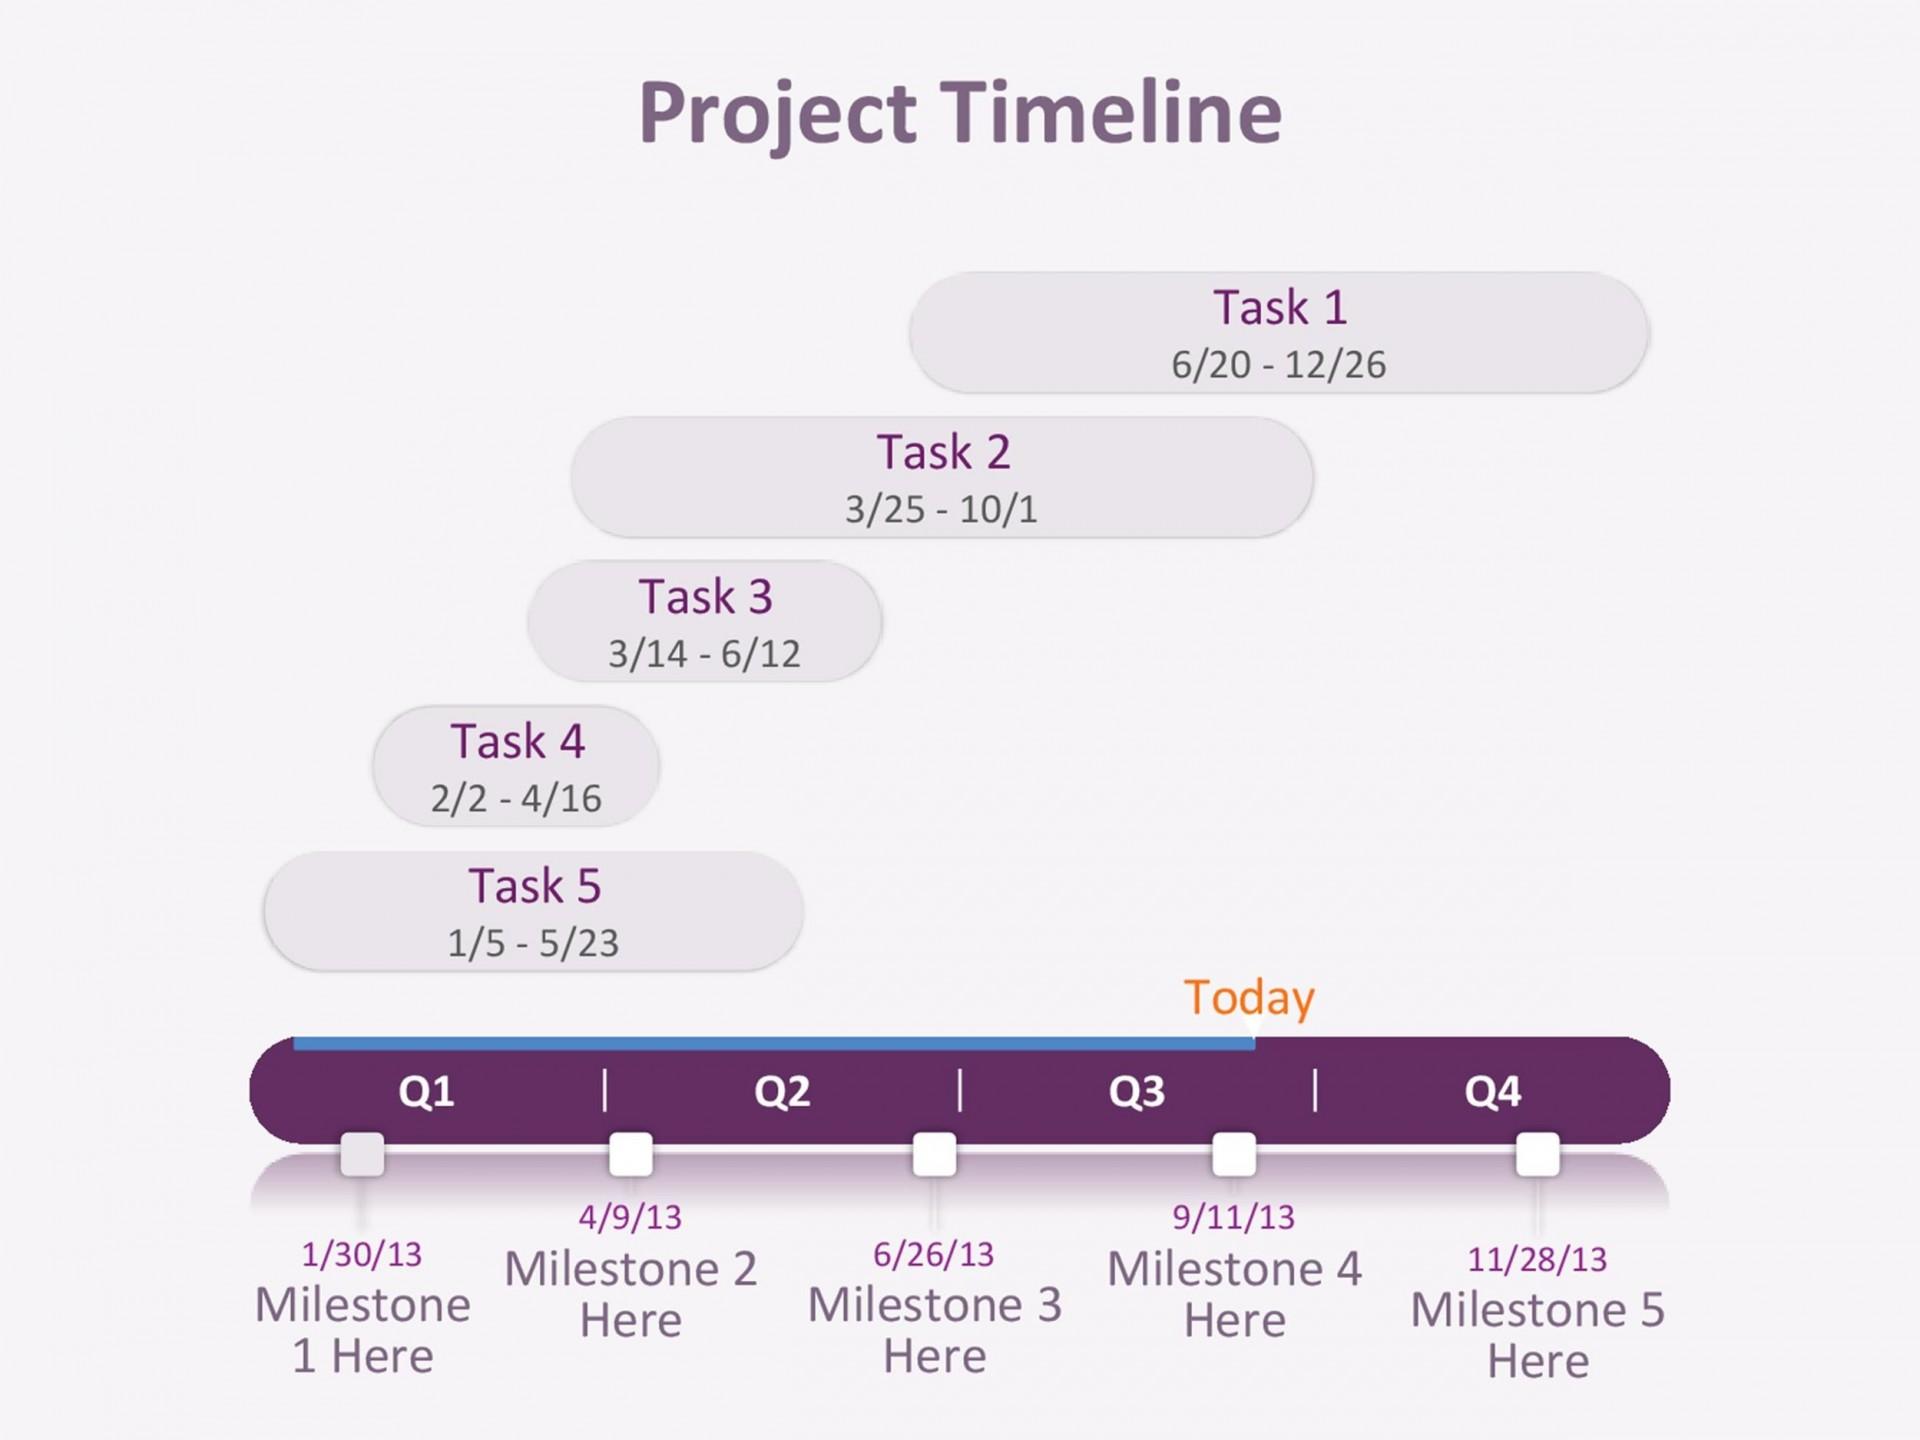 007 Remarkable Timeline Template For Word Design  Wordpres Free1920